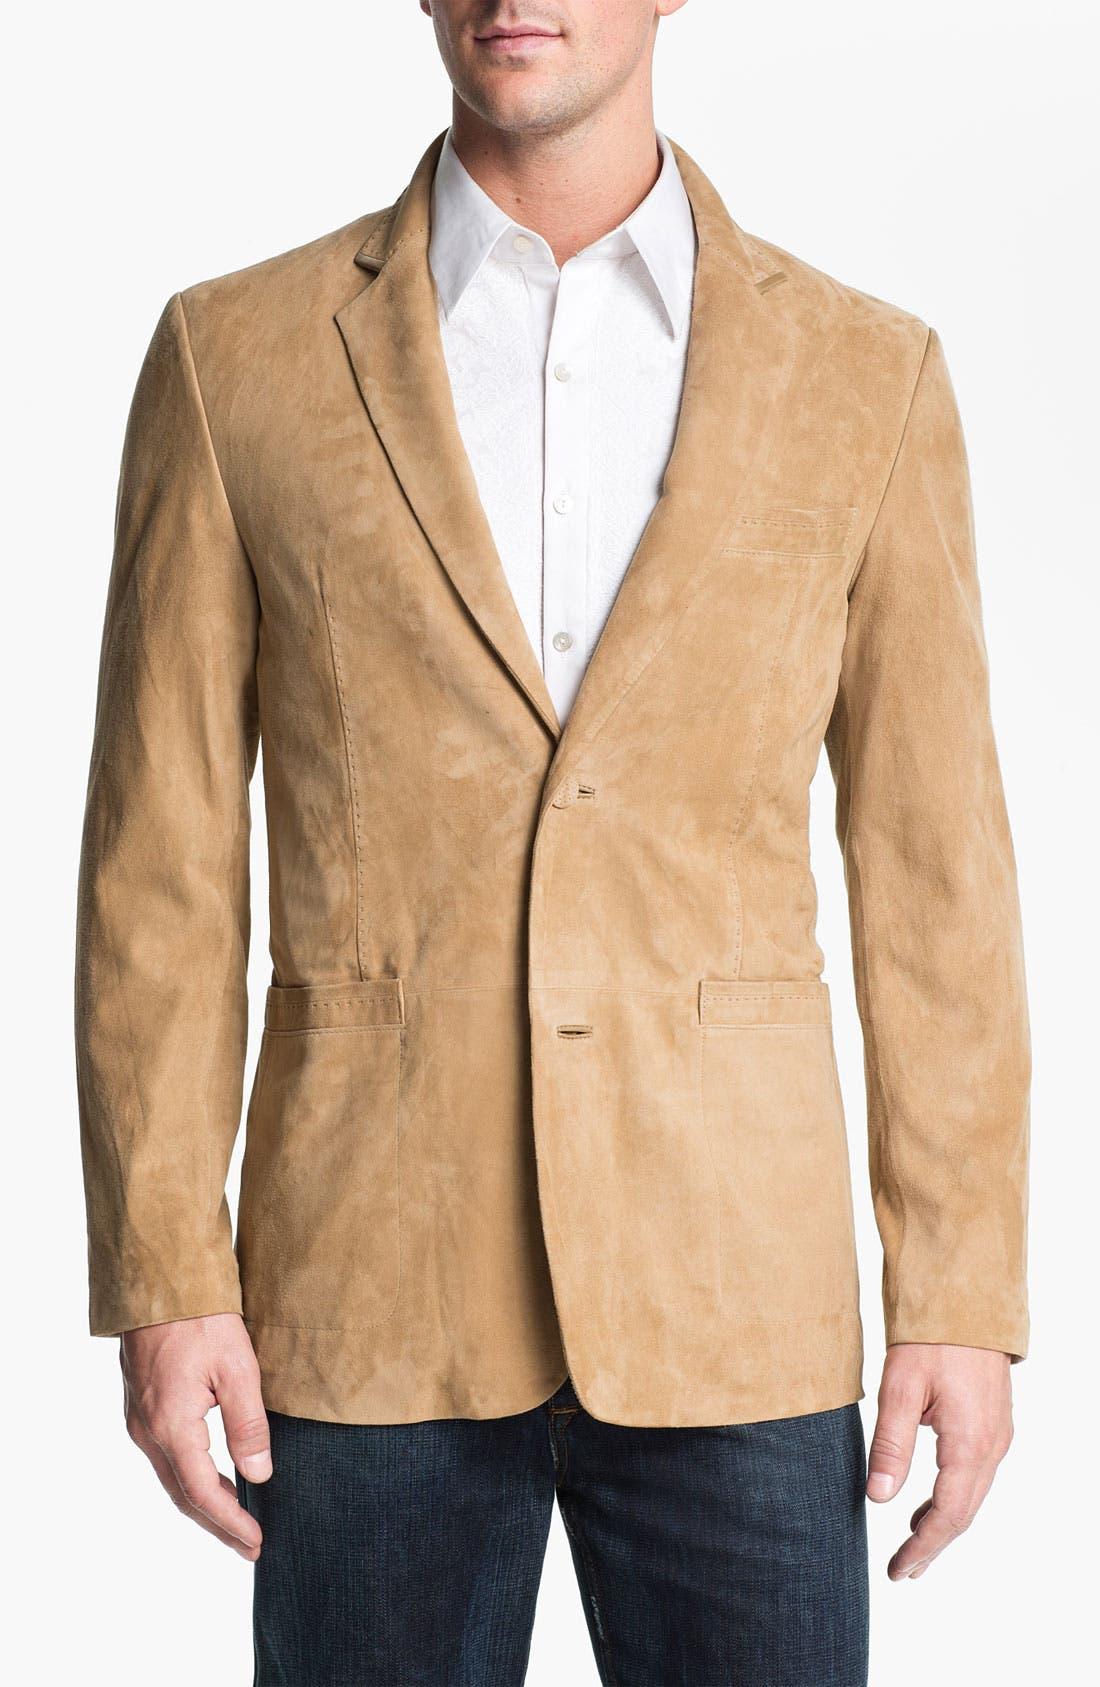 Alternate Image 1 Selected - Robert Graham 'Wythe' Suede Sportcoat